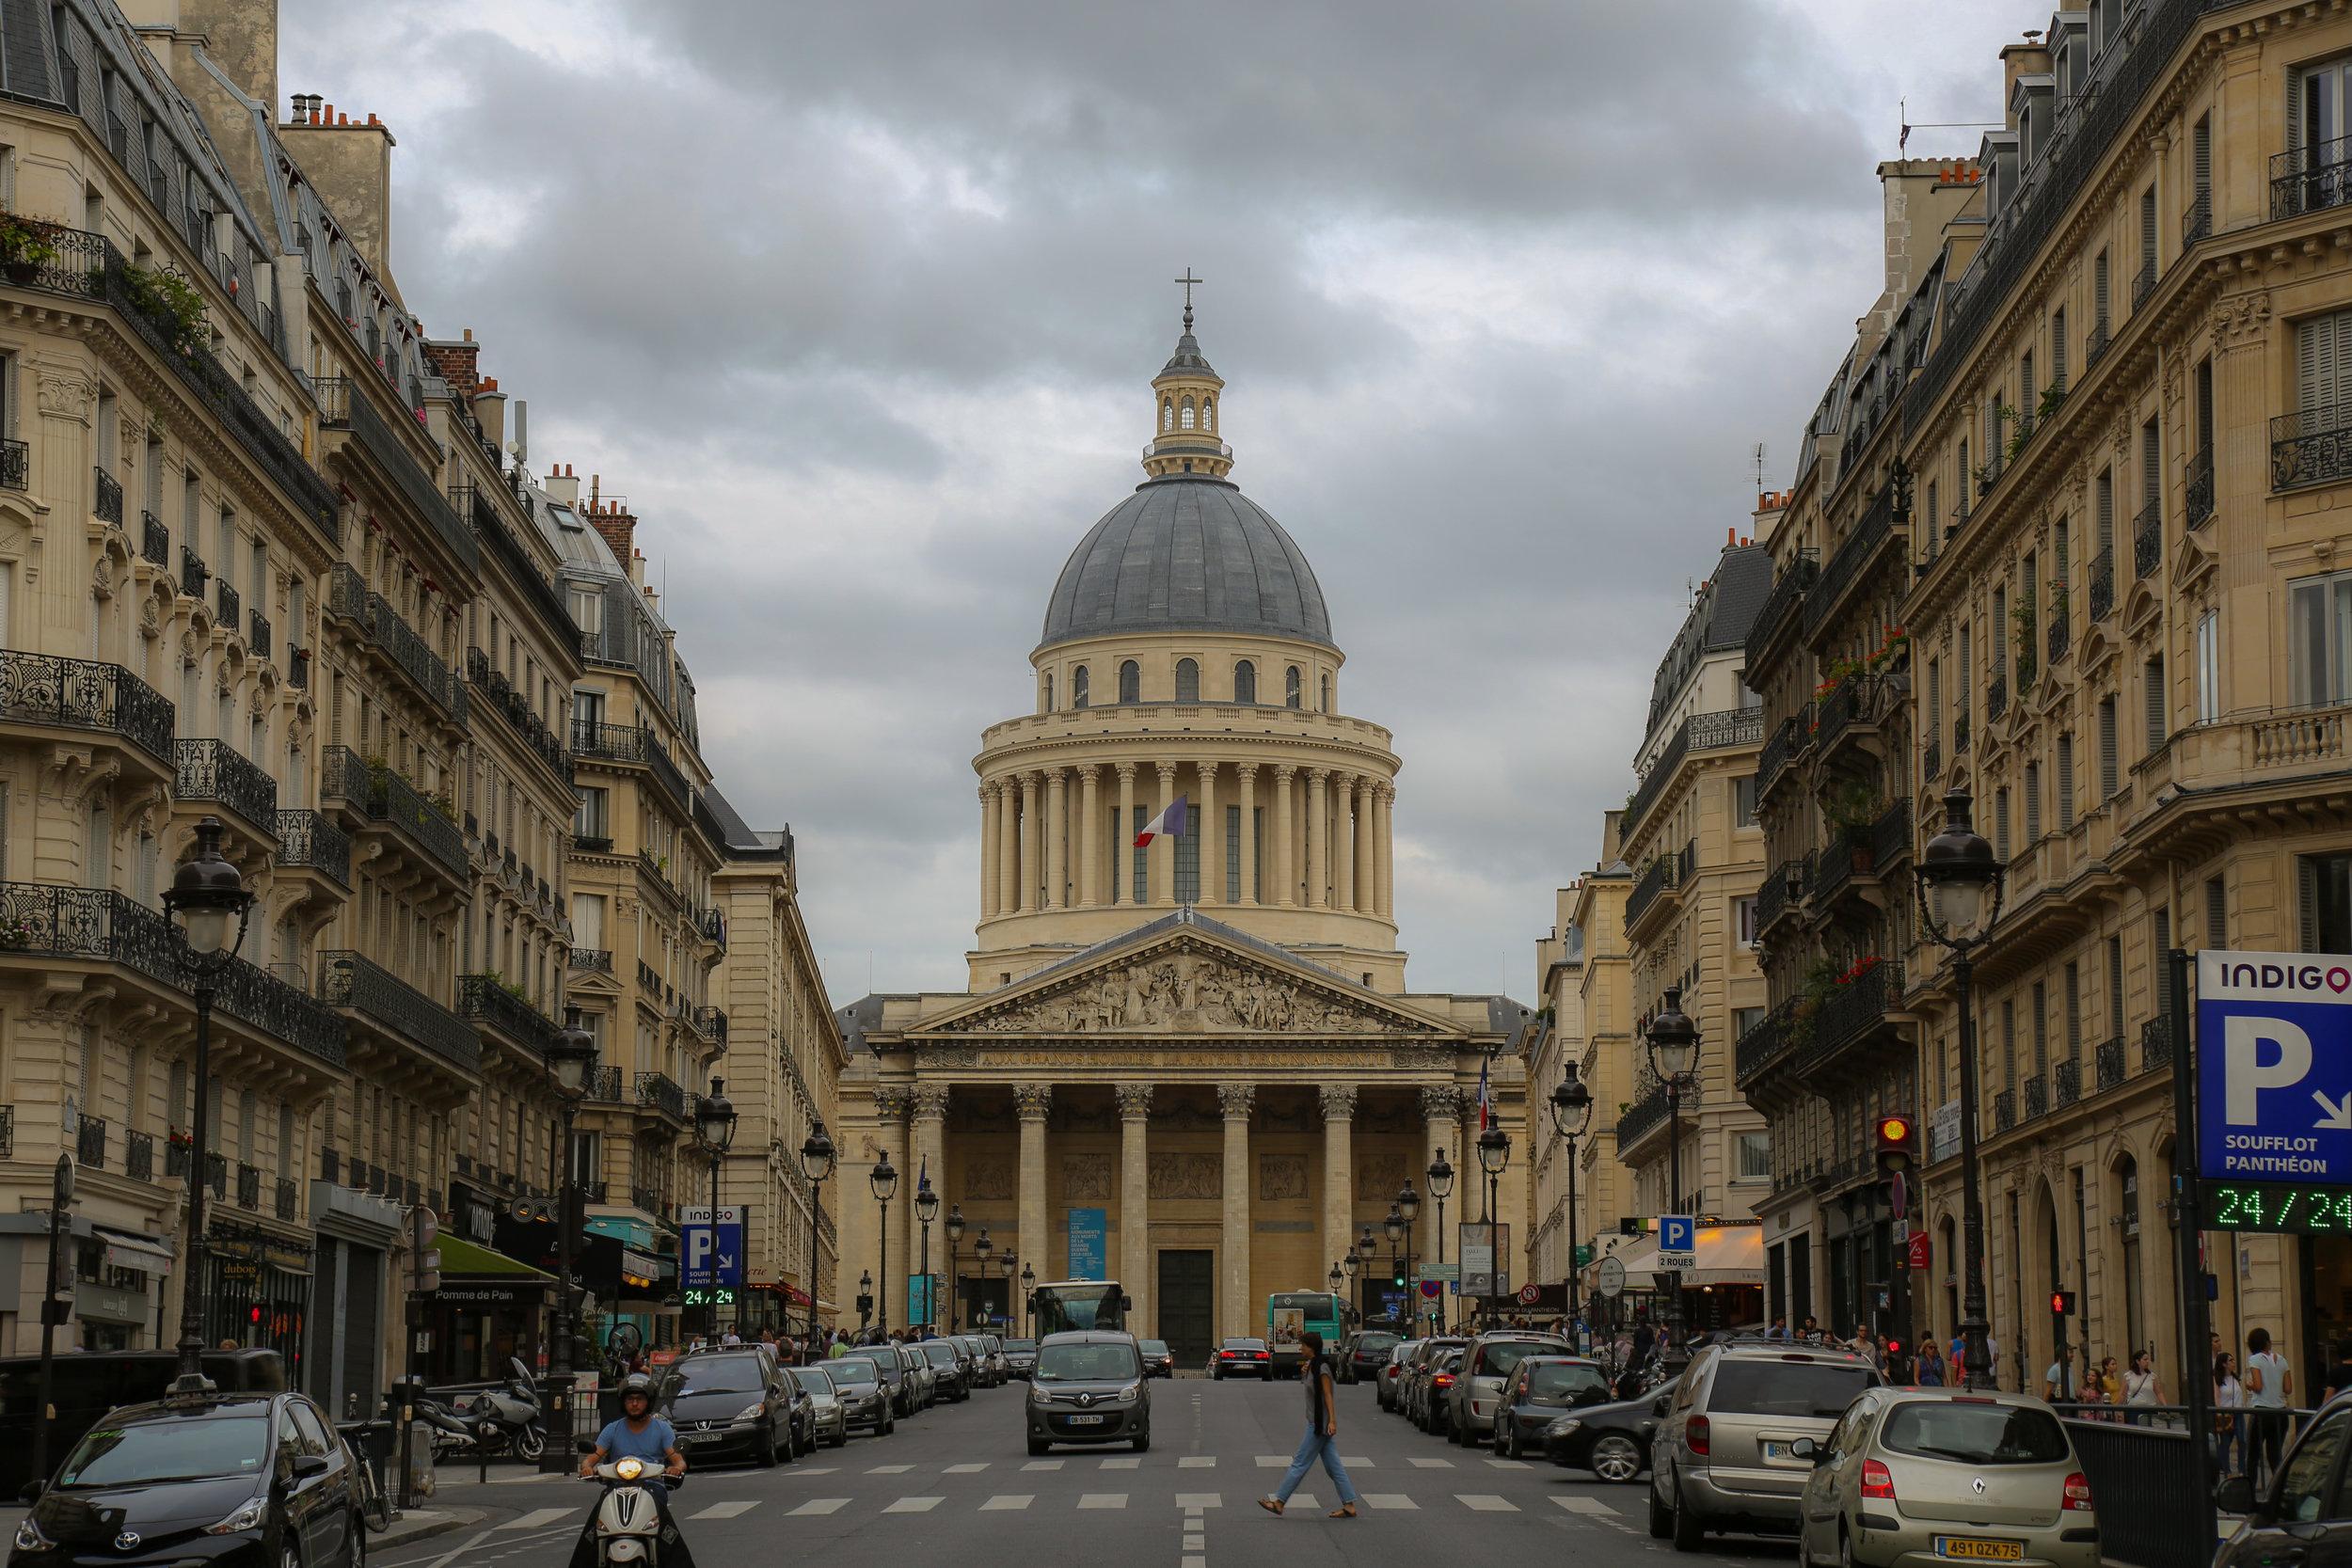 Pantheon_From_Street.jpg